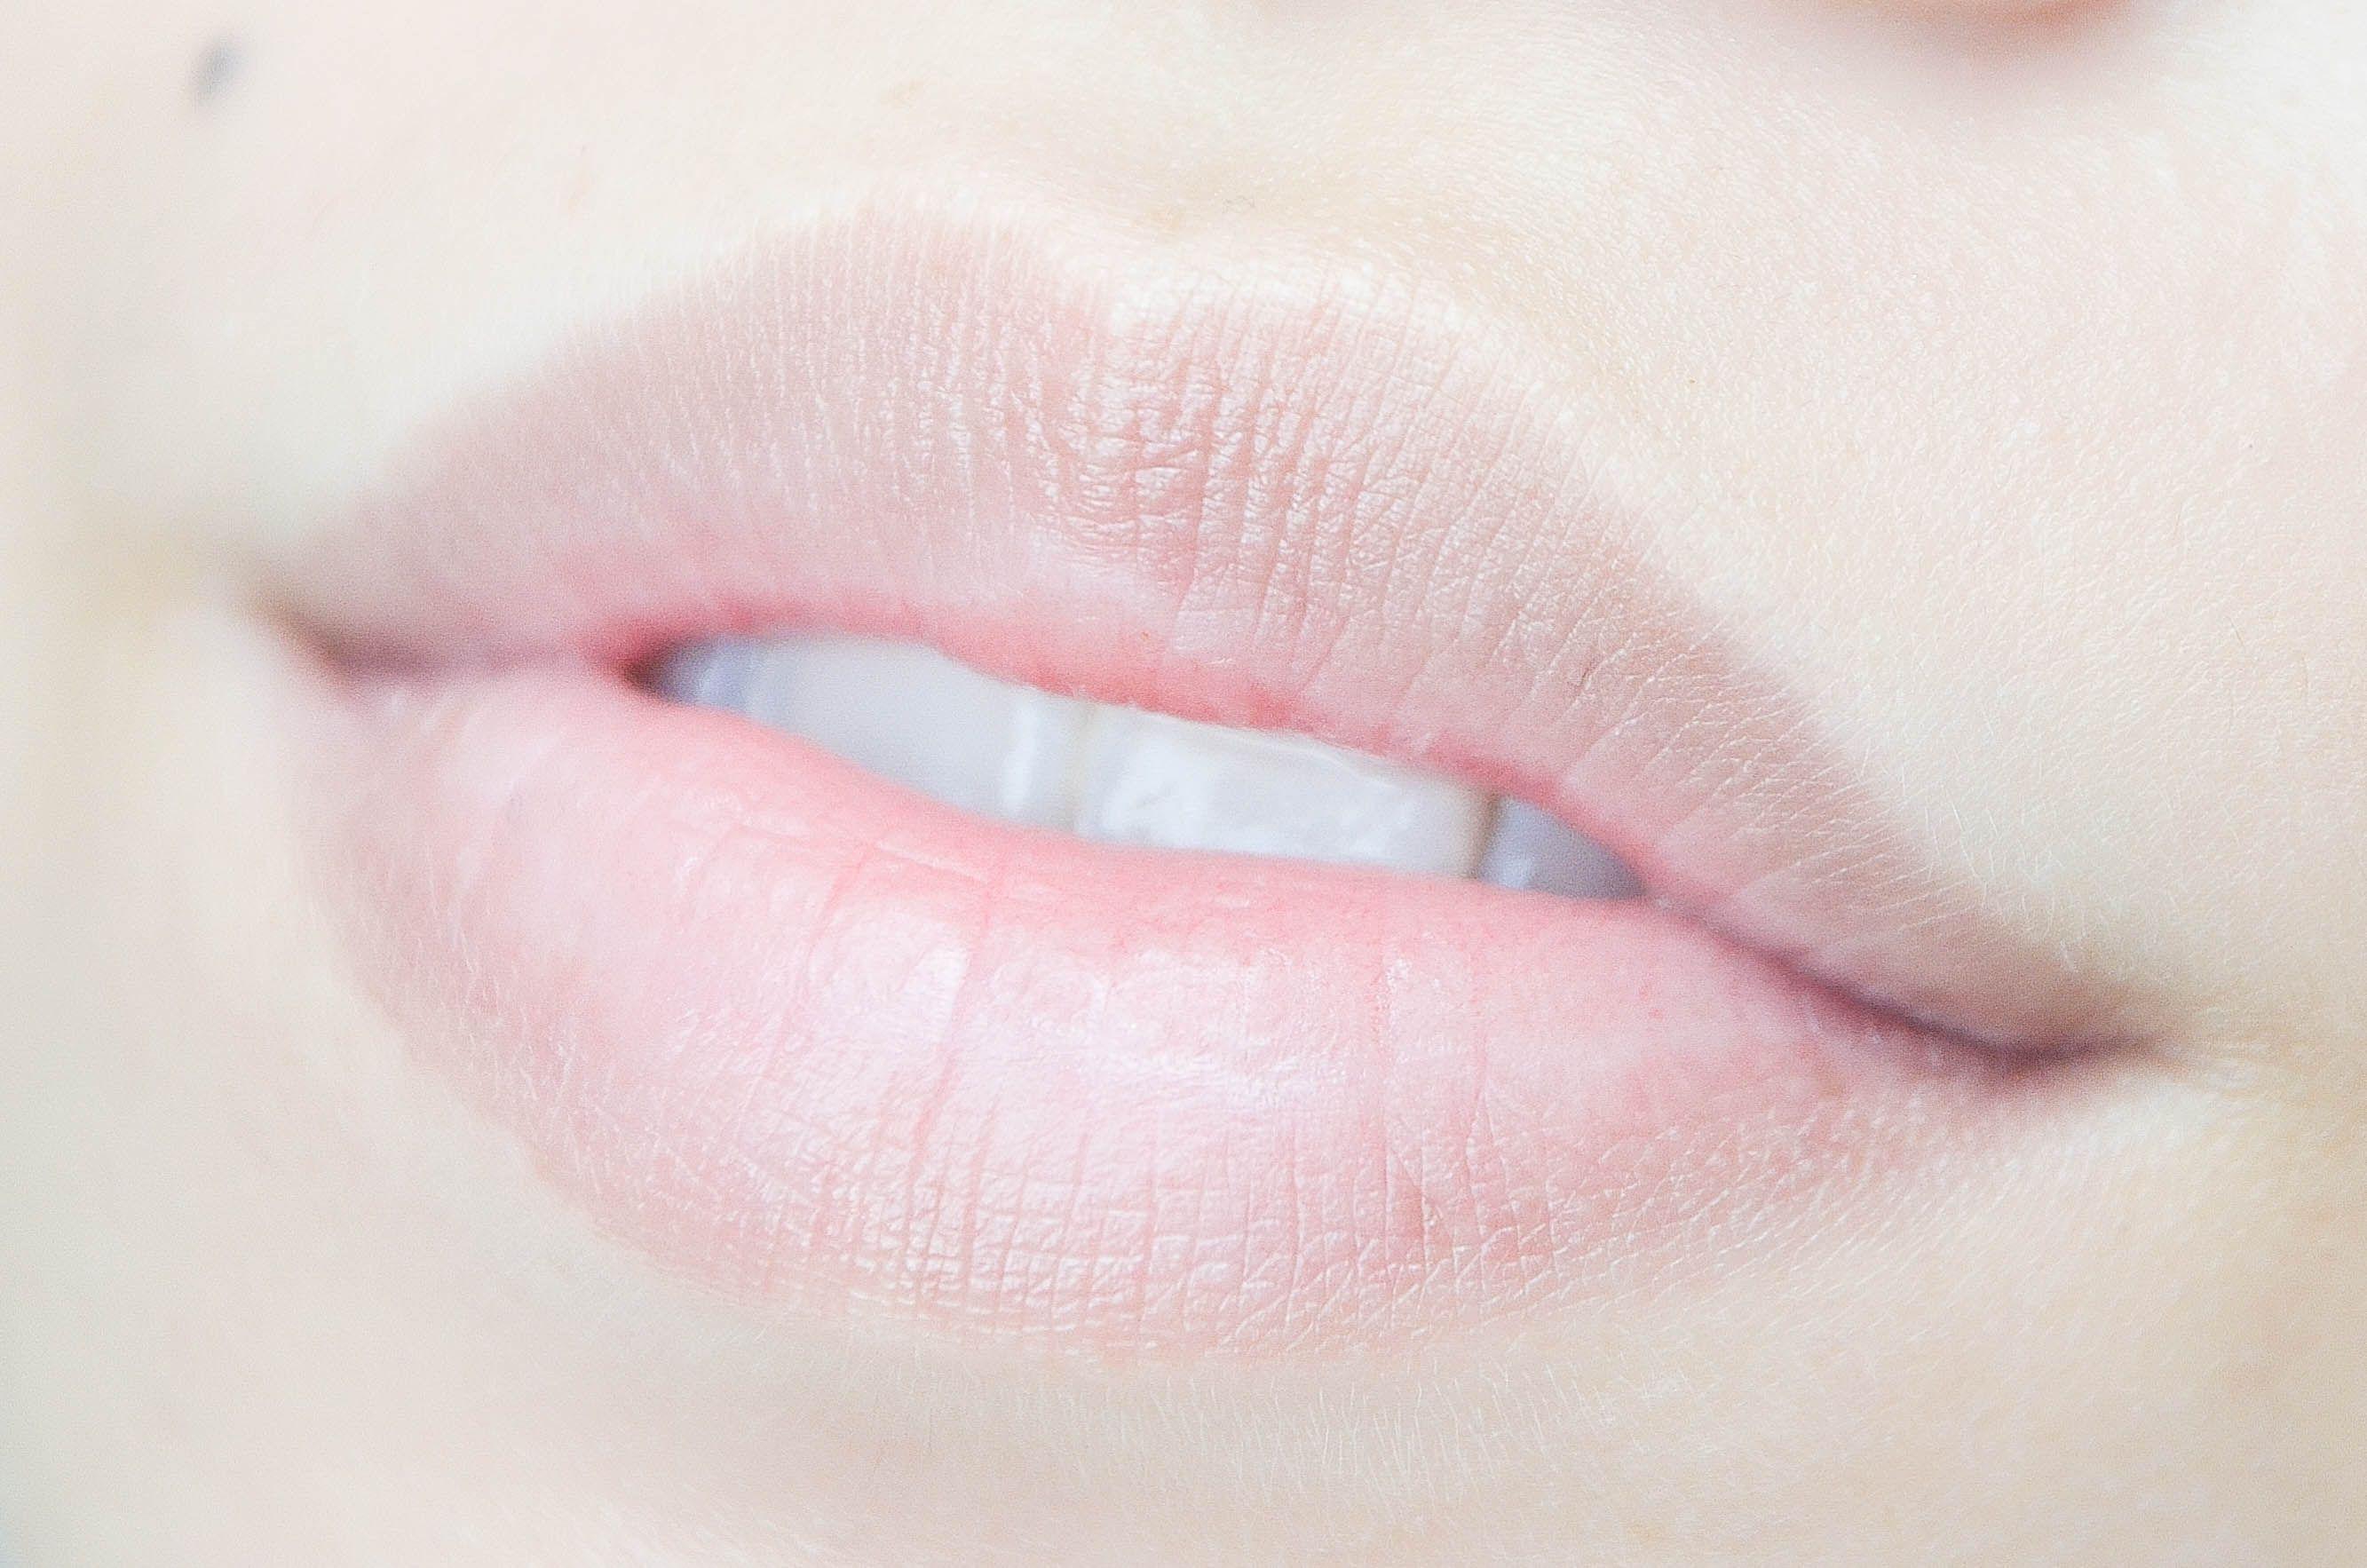 Pale lips before lip tattoo